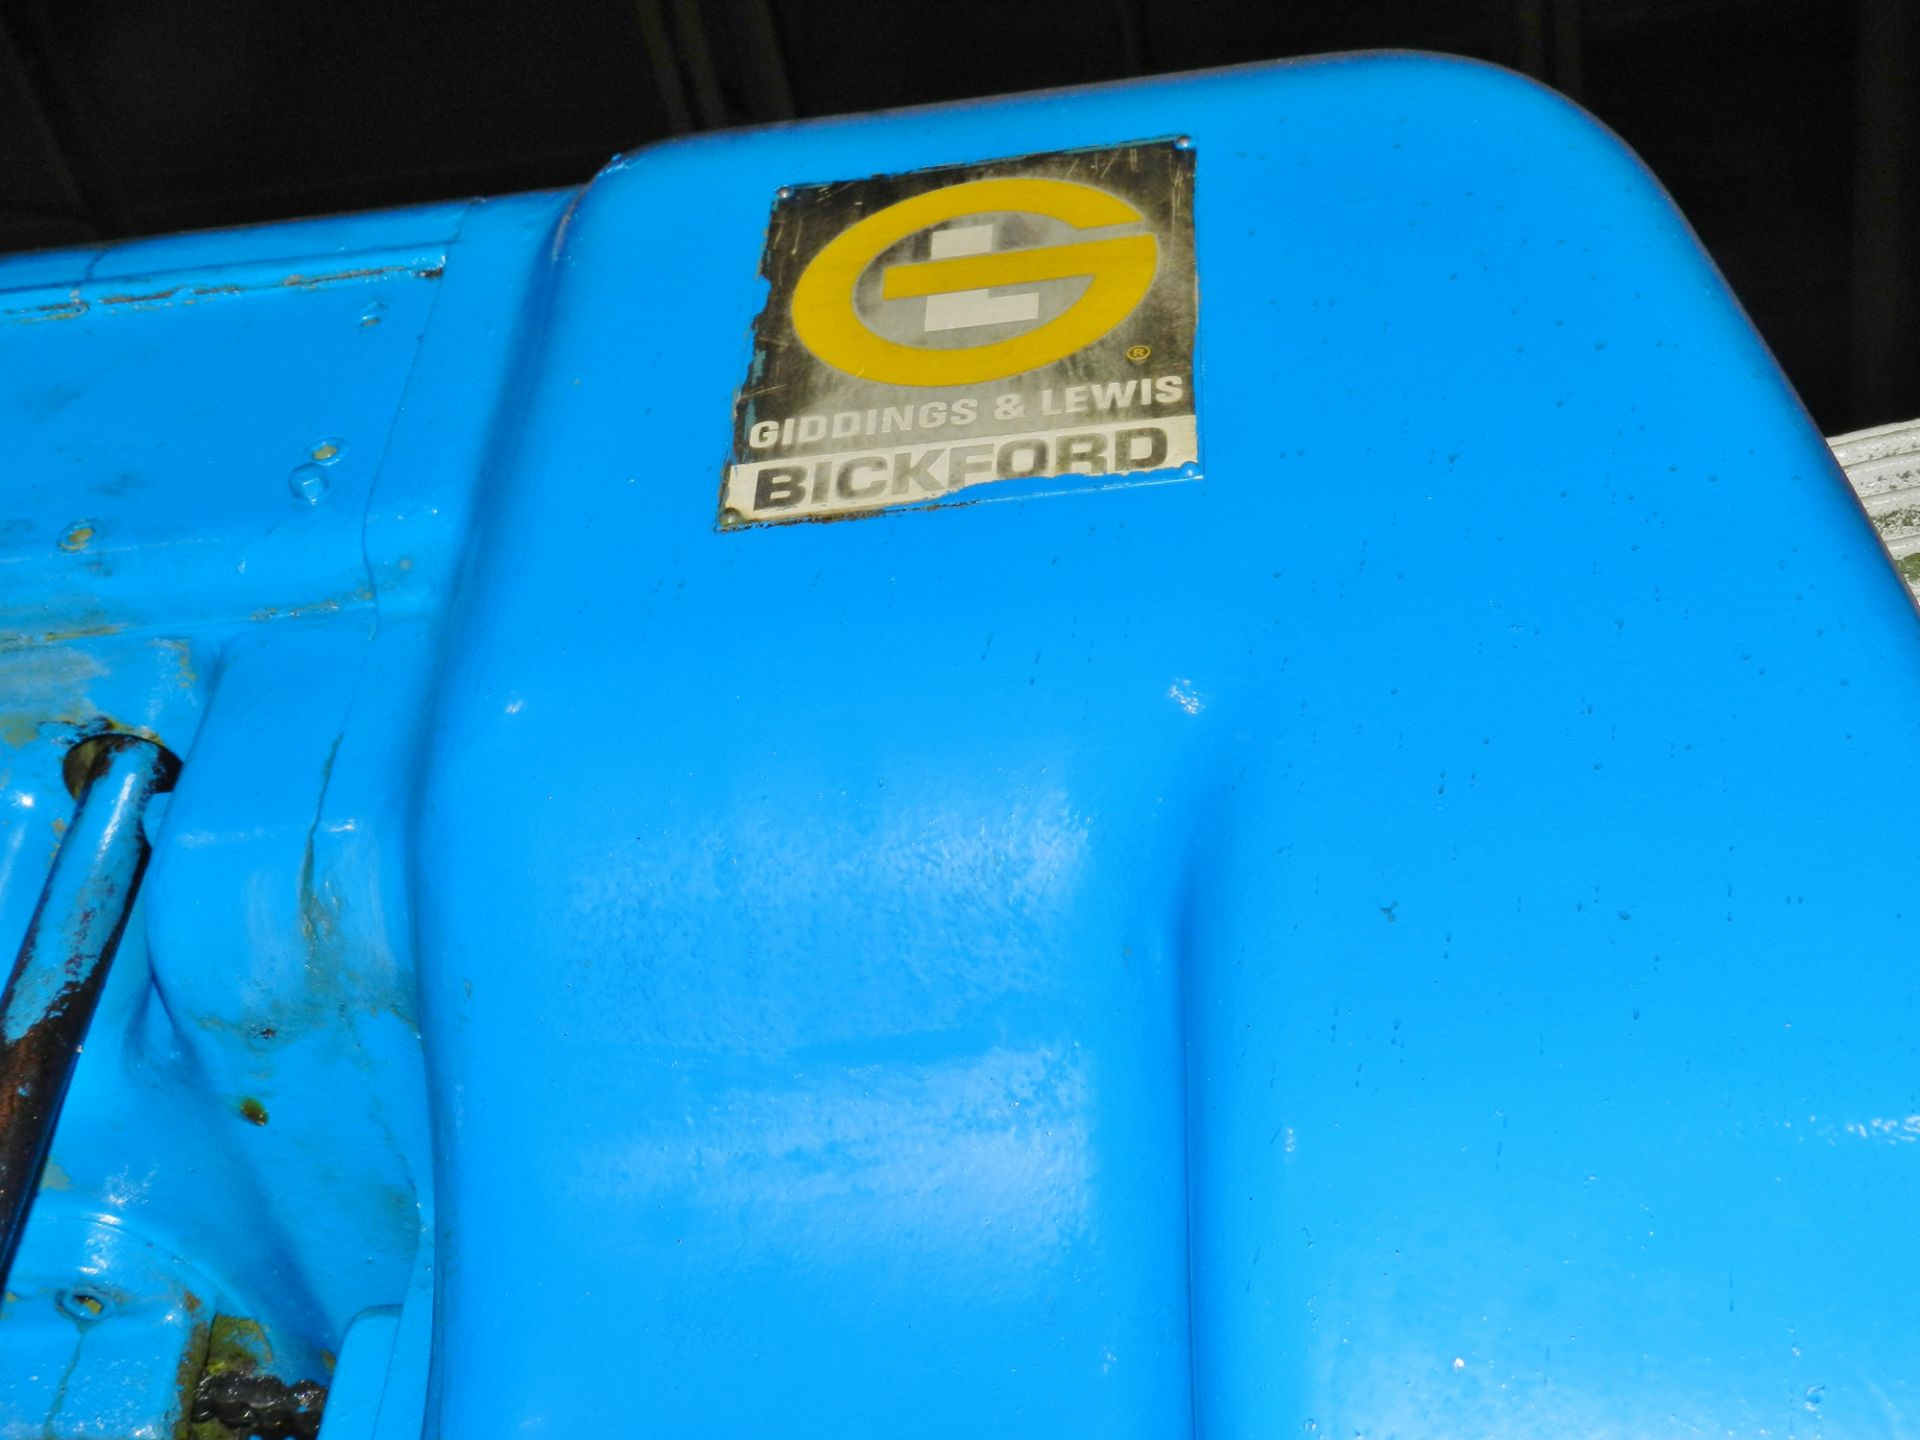 "Lot 45 - Giddings & Lewis Bickford 24"" Drill Press"